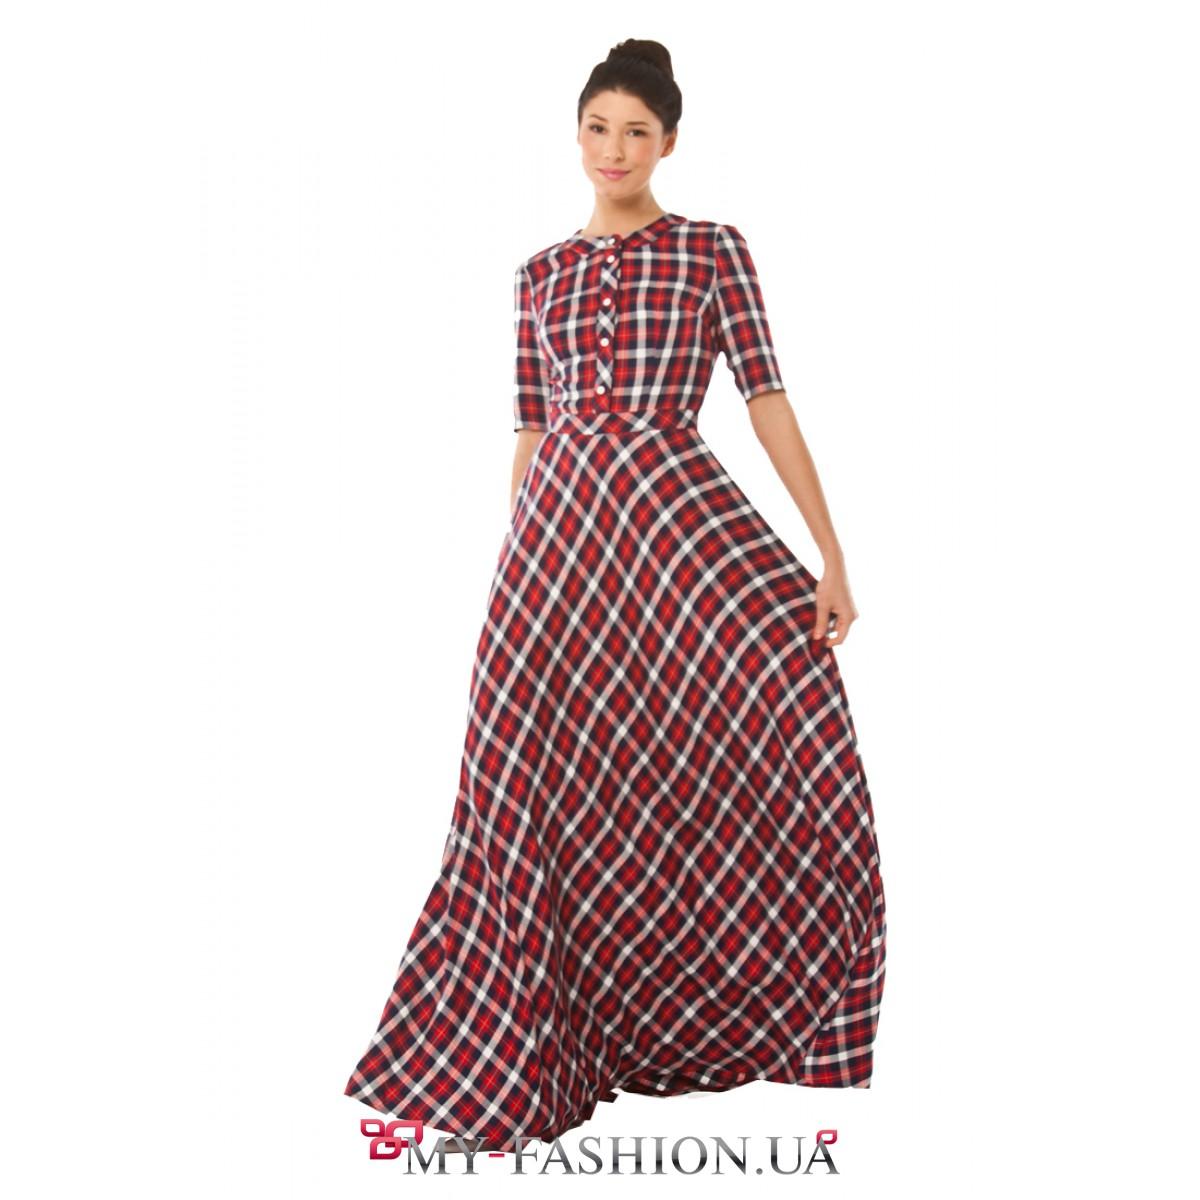 Блузки fashion доставка